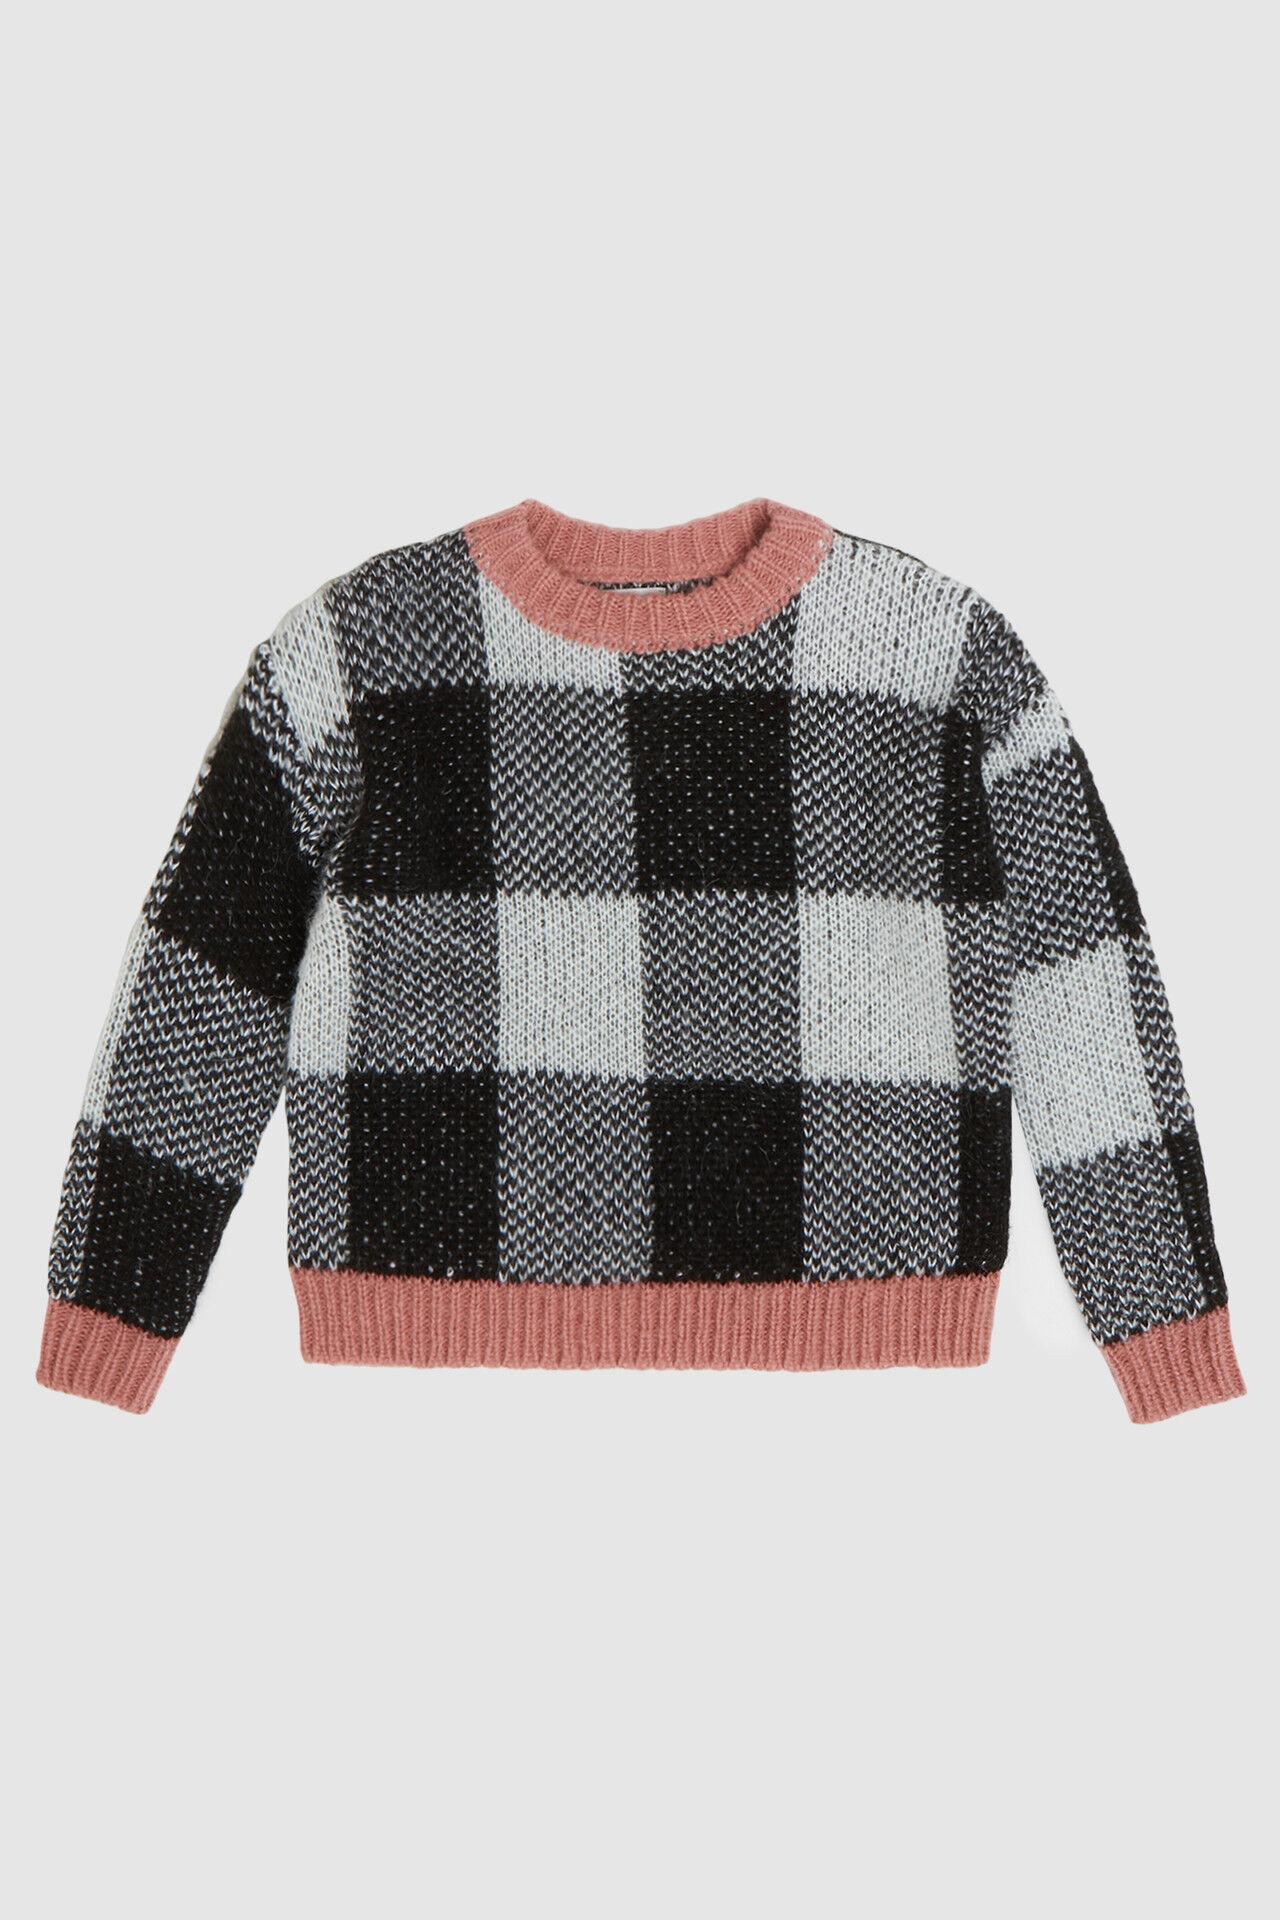 Checked Crewneck Sweater - Woolrich Junior